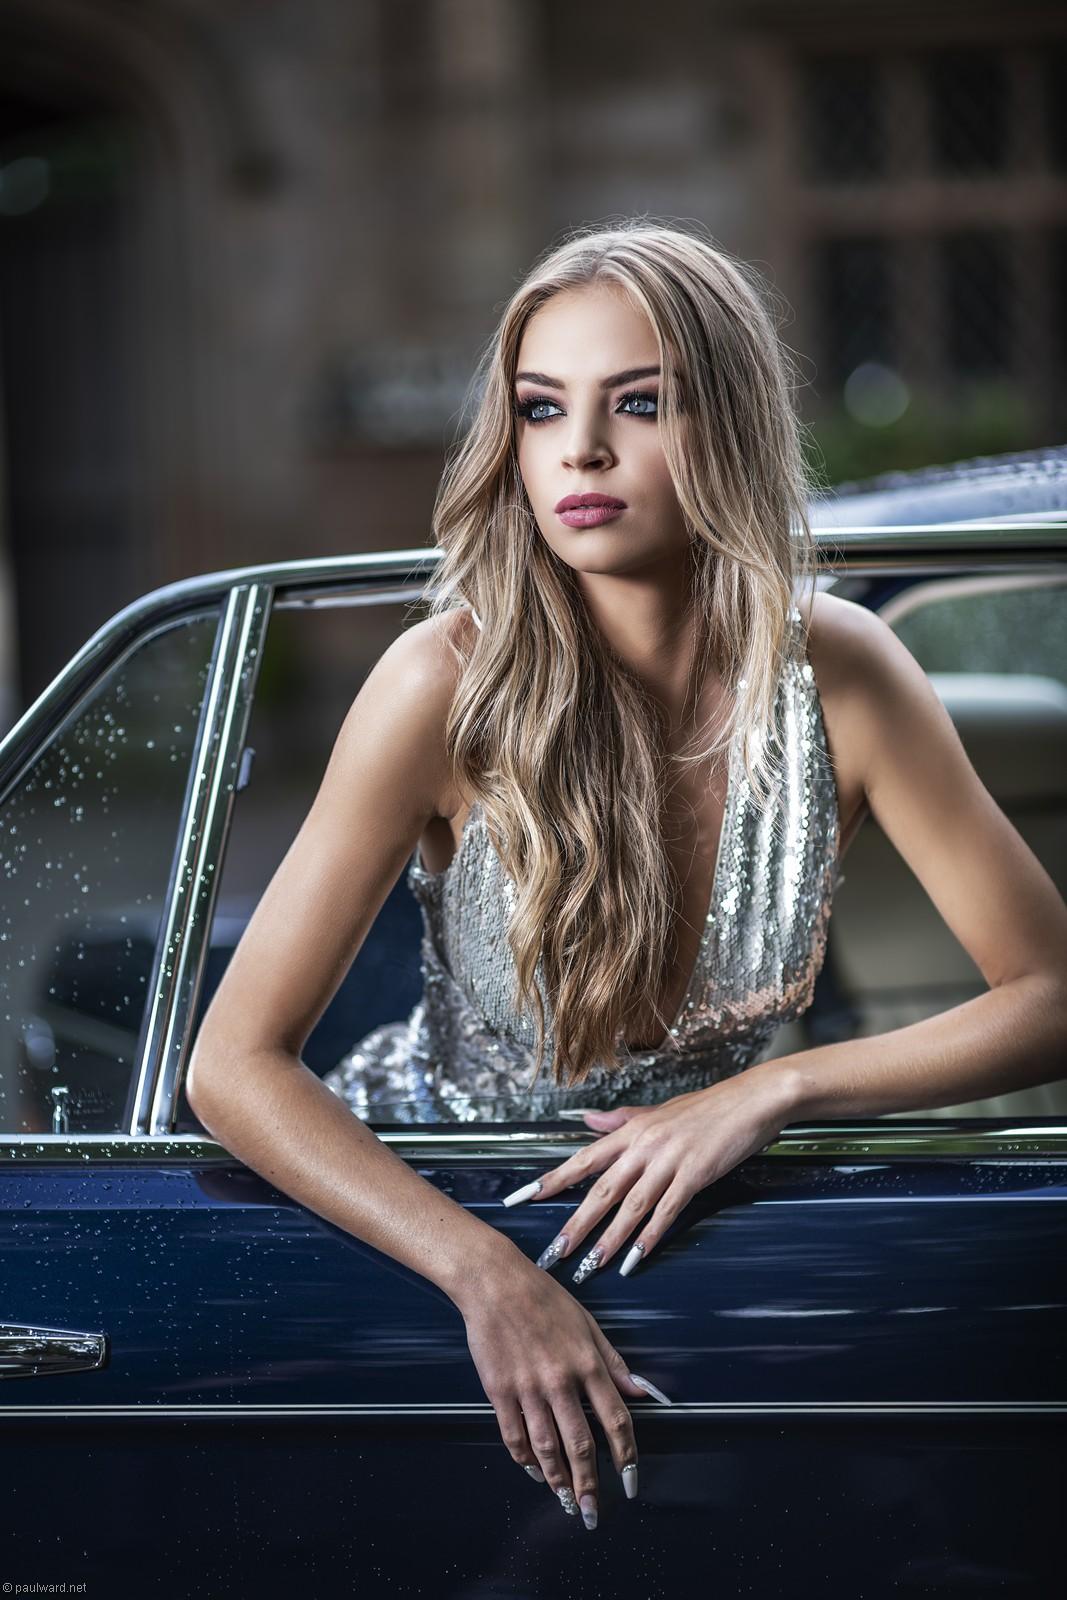 Fashion photographer birmingham, Model Lucia Needham by Paul Ward